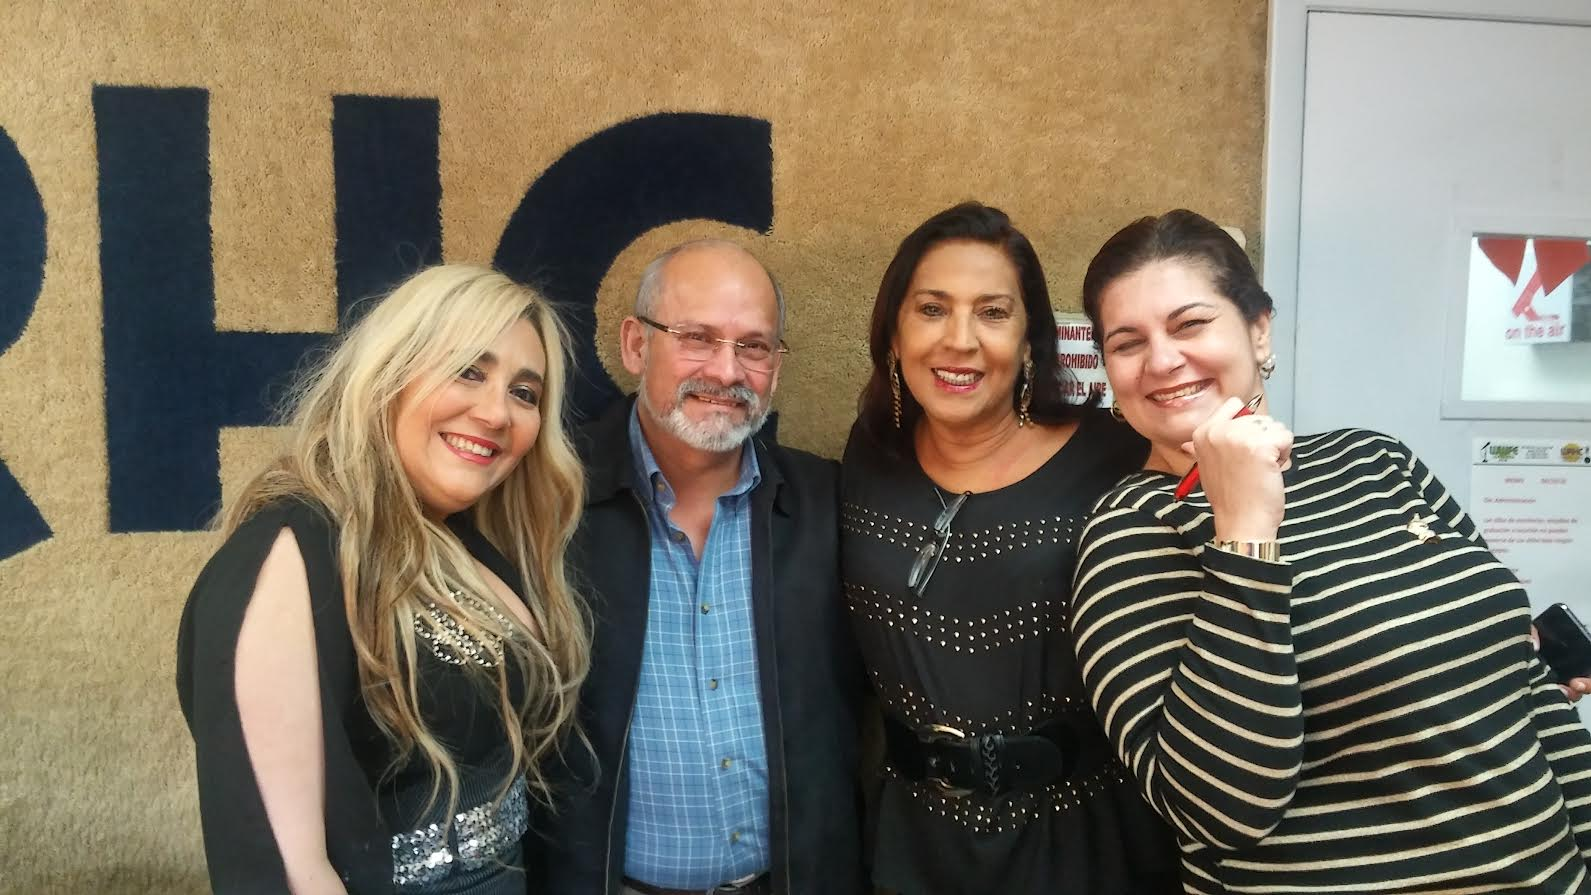 Marisol Casola, Jairo Velasquez, Alma Pineda y Mariela Montes.